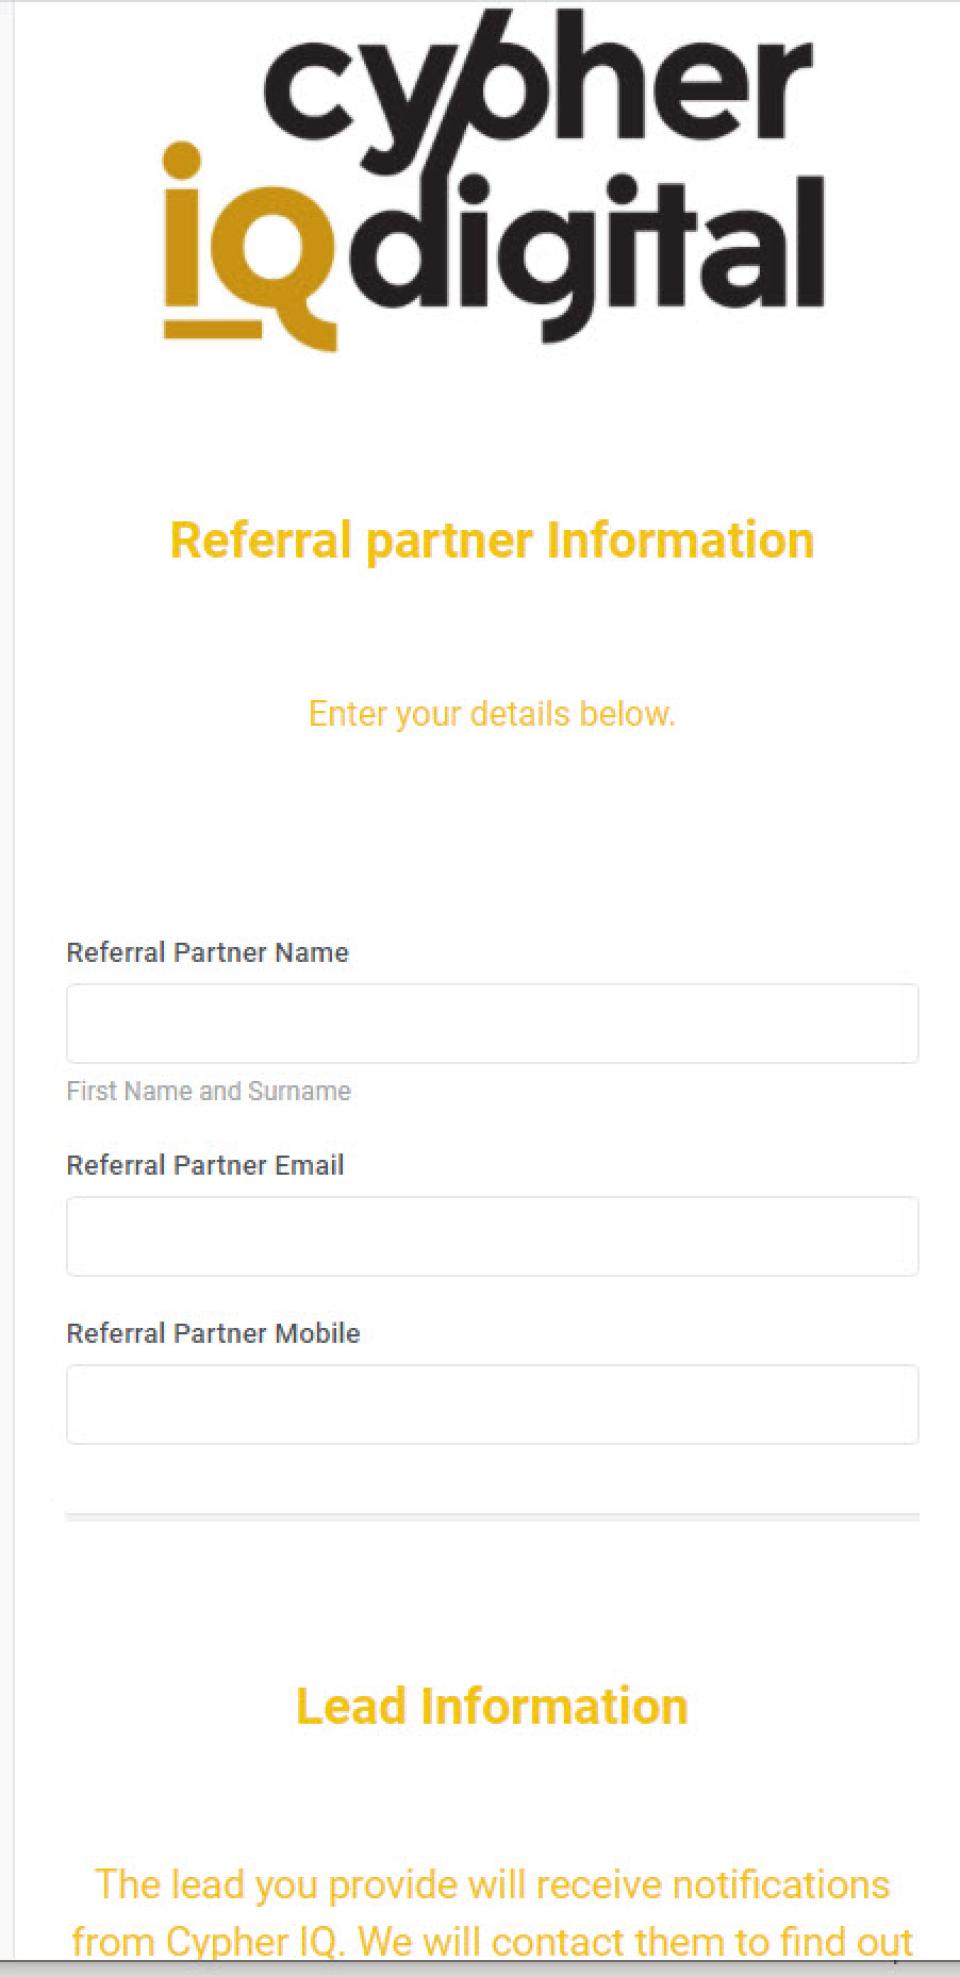 Cypher IQ partner information